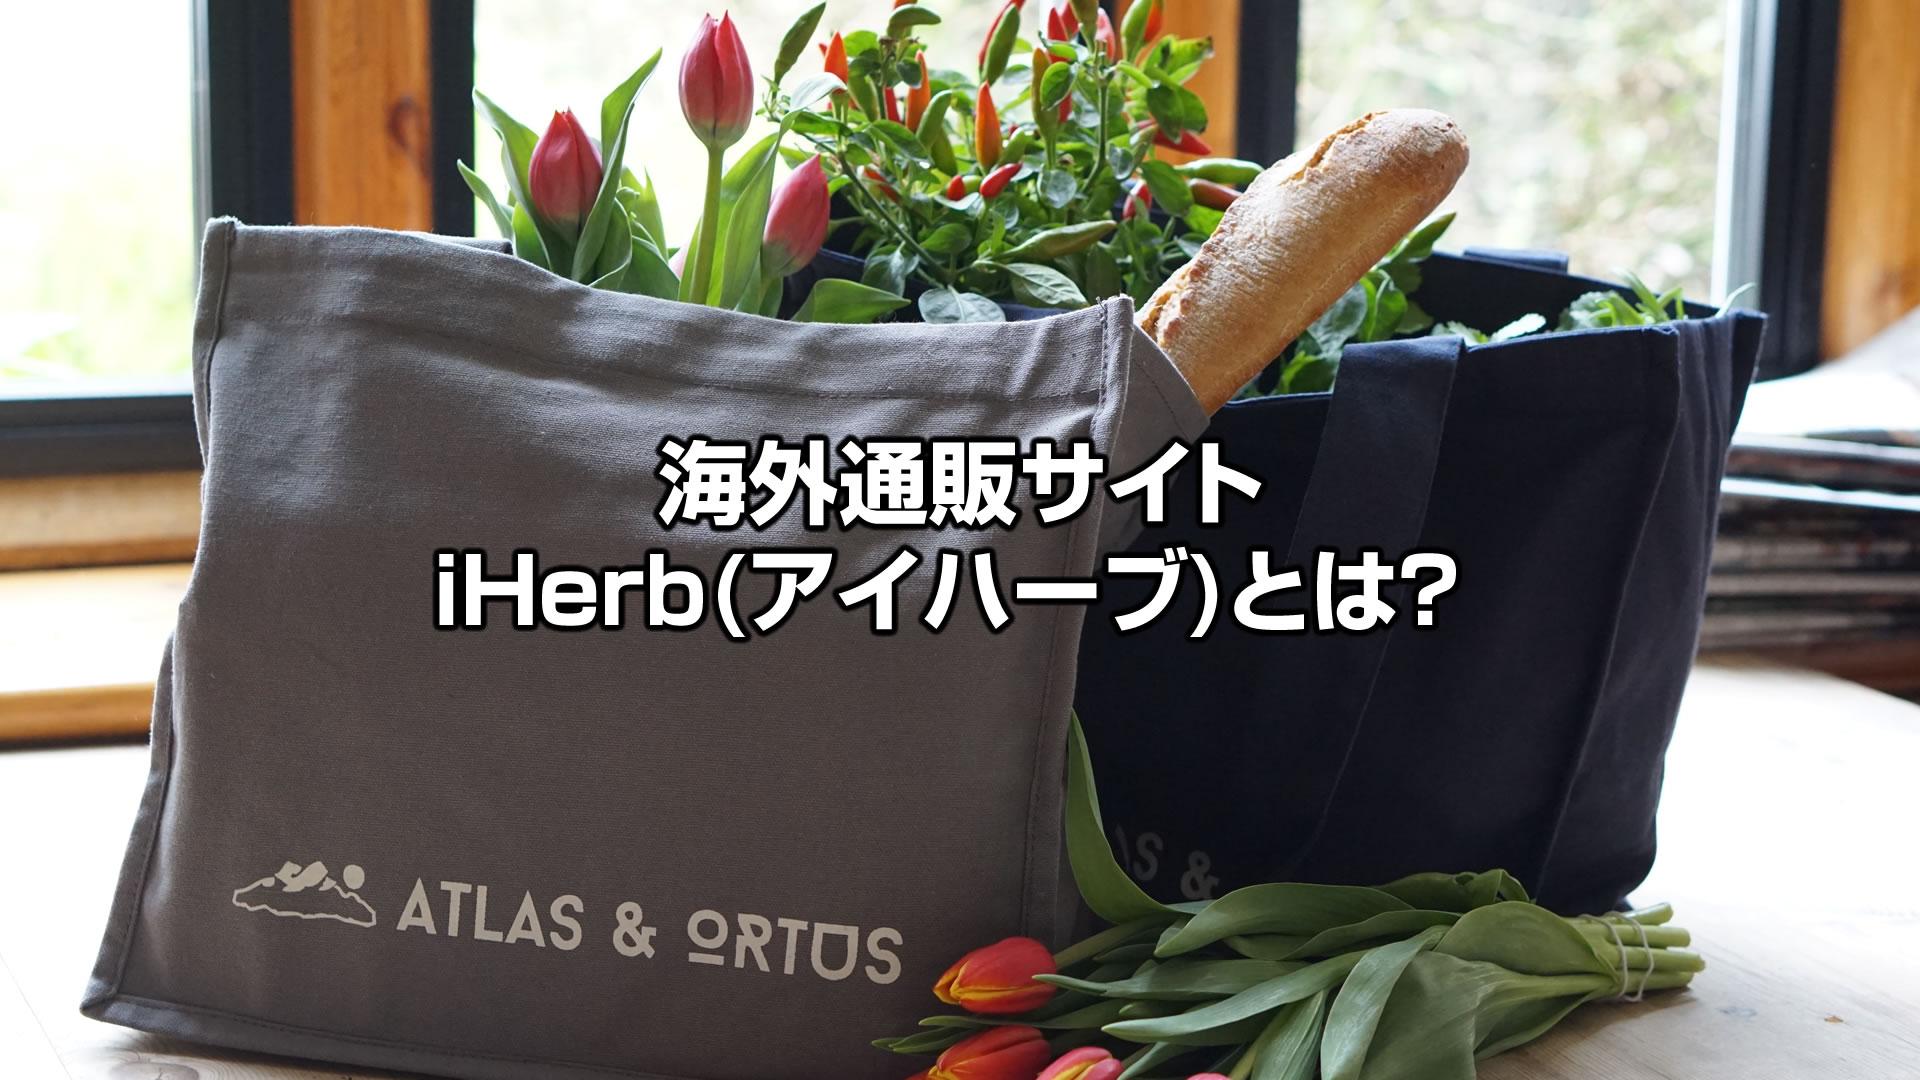 iHerb(アイハーブ)は安全?気になる海外通販サイト!